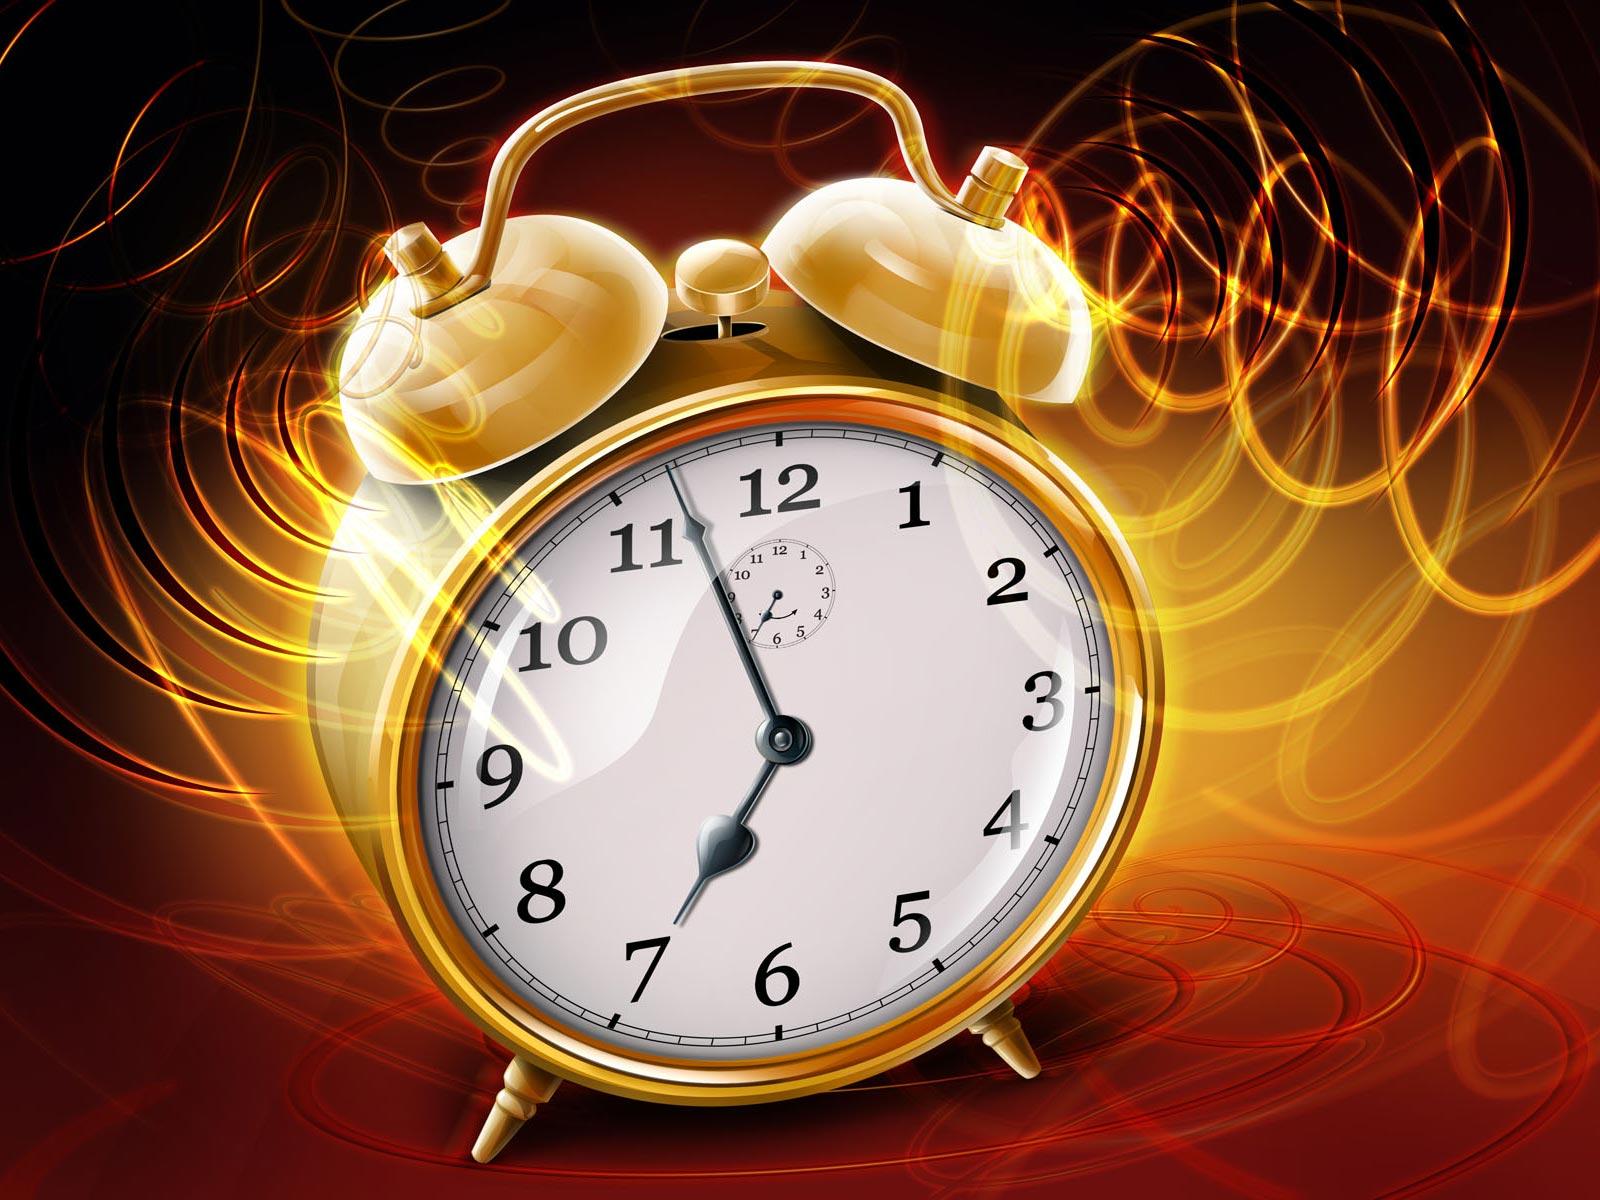 http://1.bp.blogspot.com/_JiejkFsJuN0/S0qihO8wnFI/AAAAAAAAAU8/SVj6X-T4flo/s1600/Alarm_clock.jpg